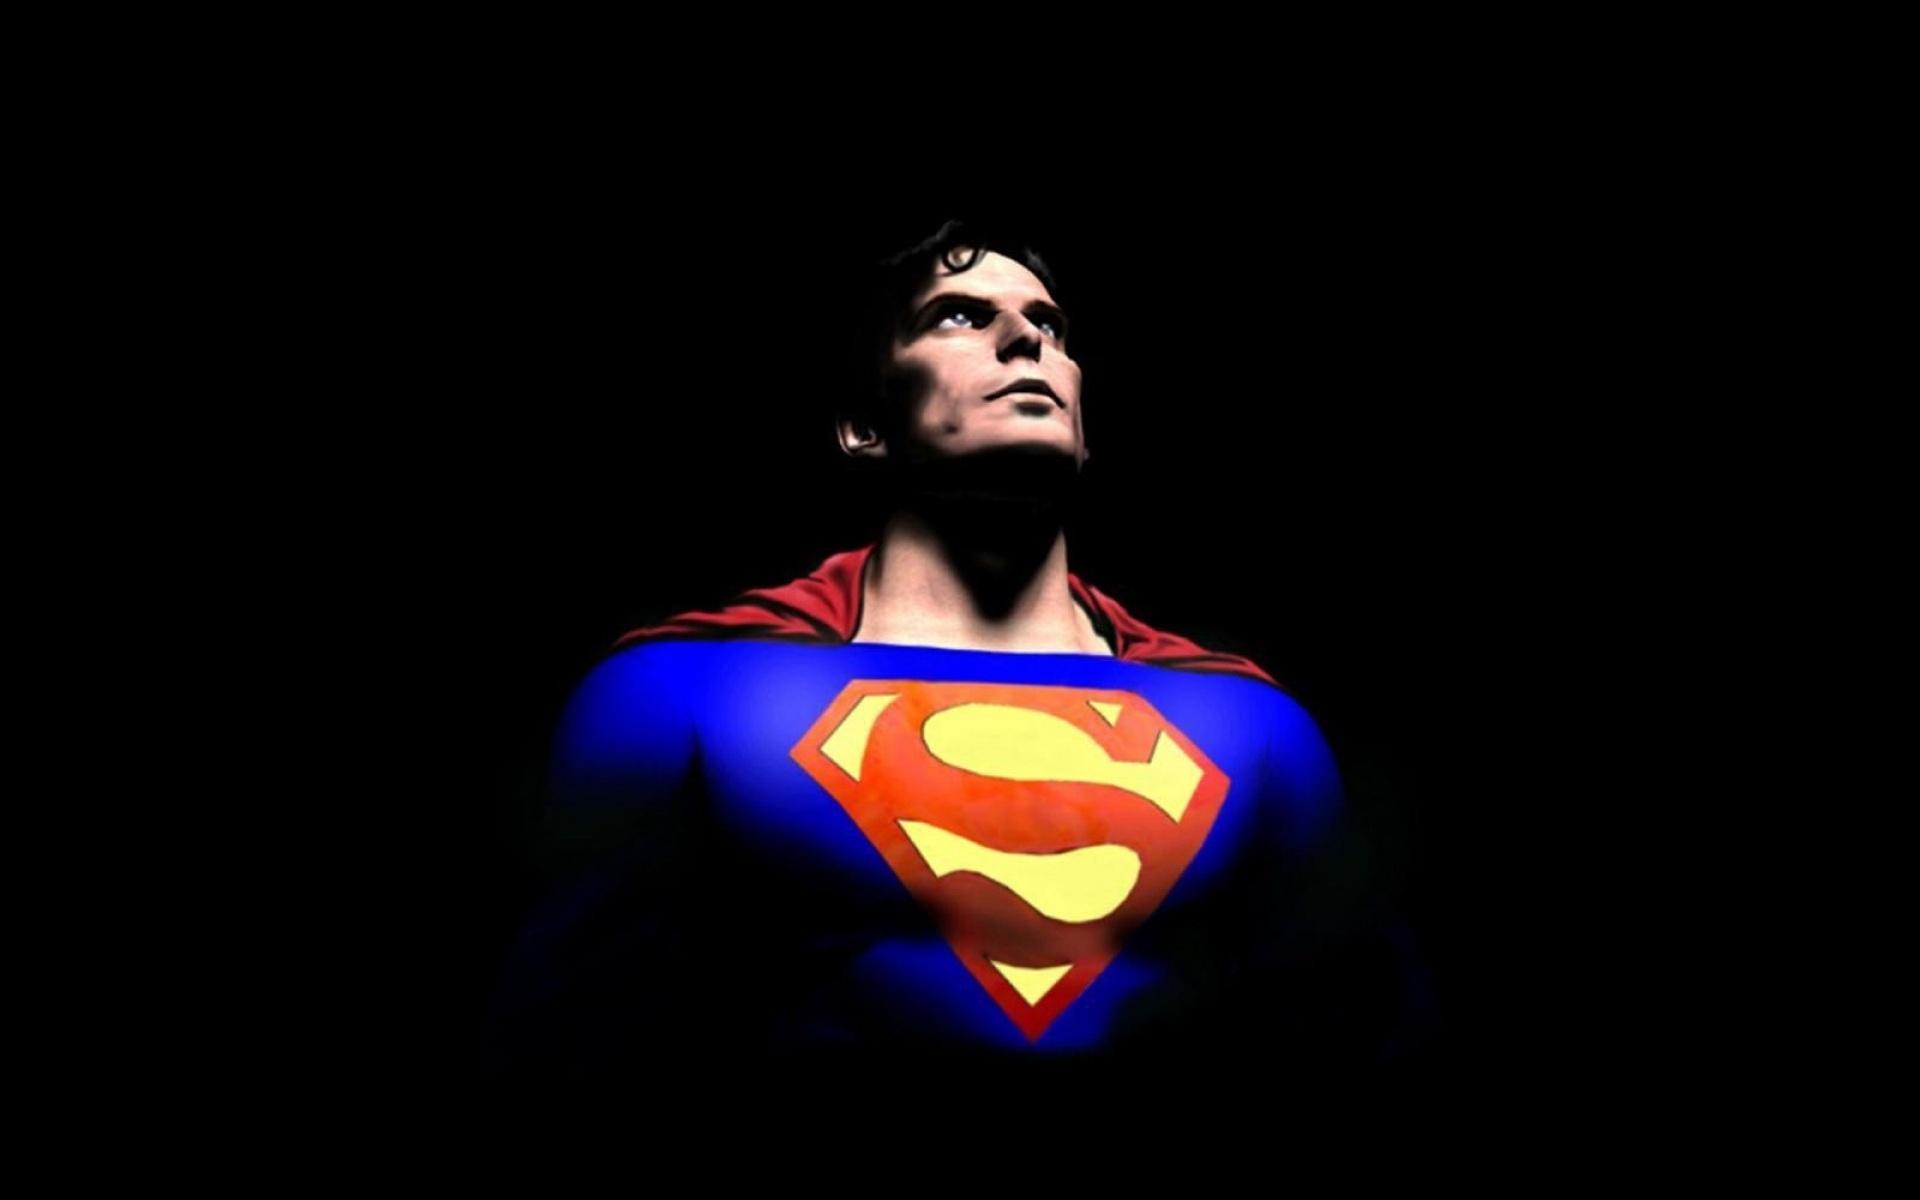 superman-hd-wallpaper-and-desktop-background